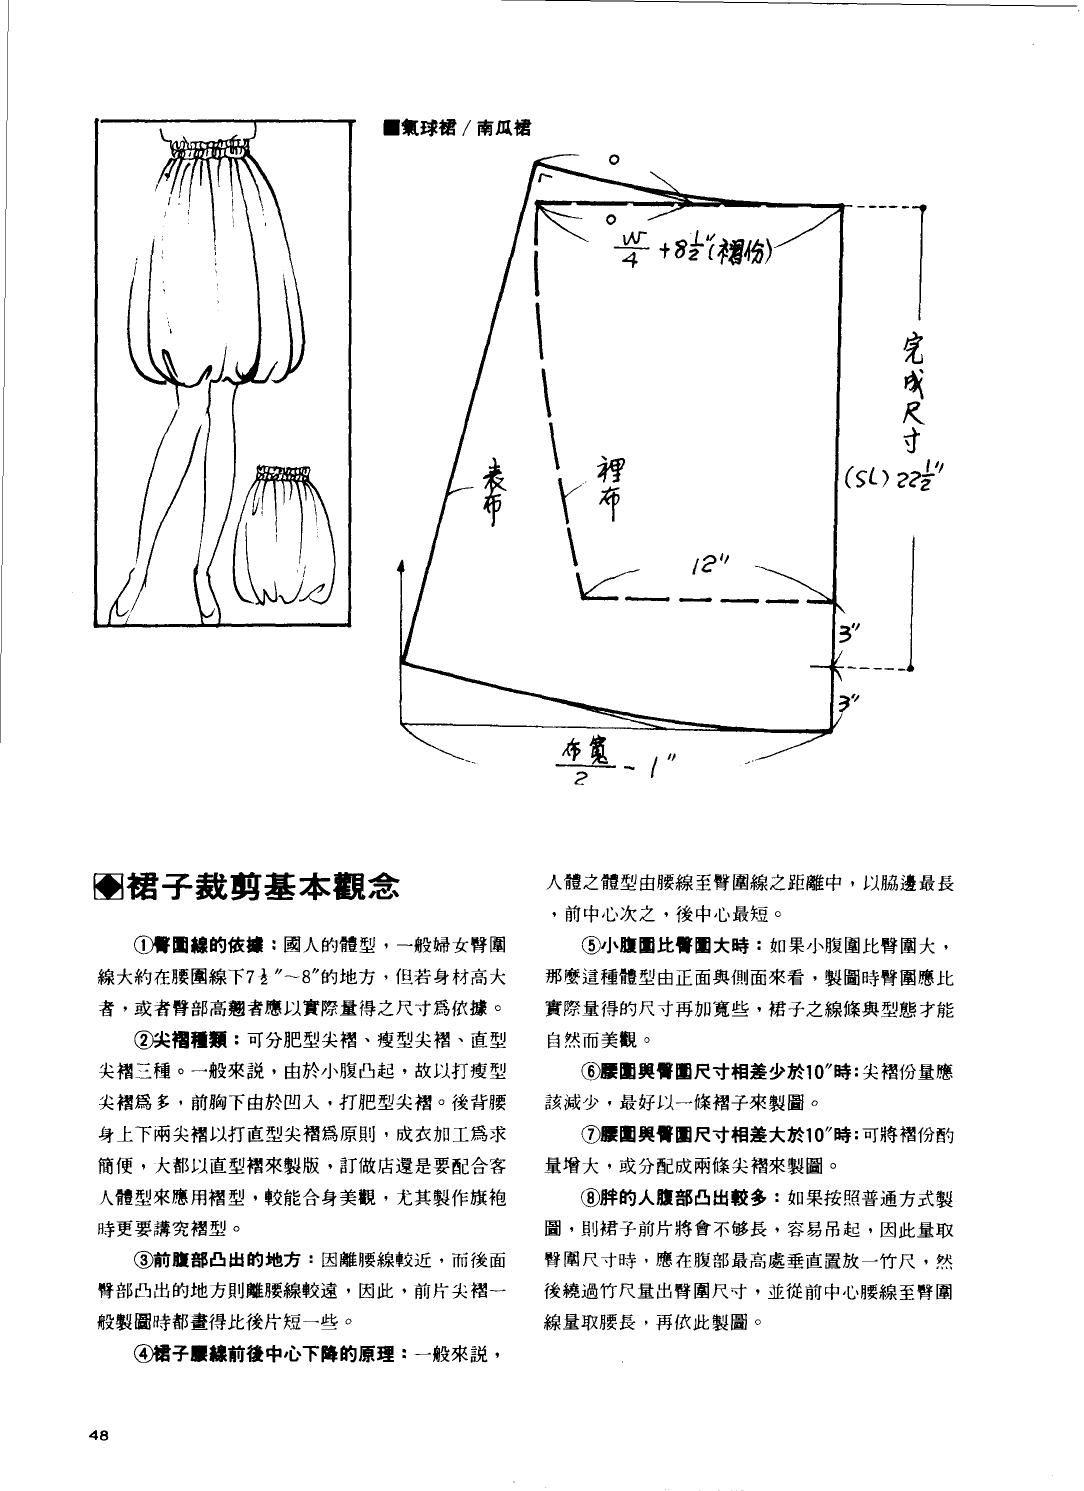 1989 cutting chapter skirts China | 패턴 | Pinterest | Costura ...